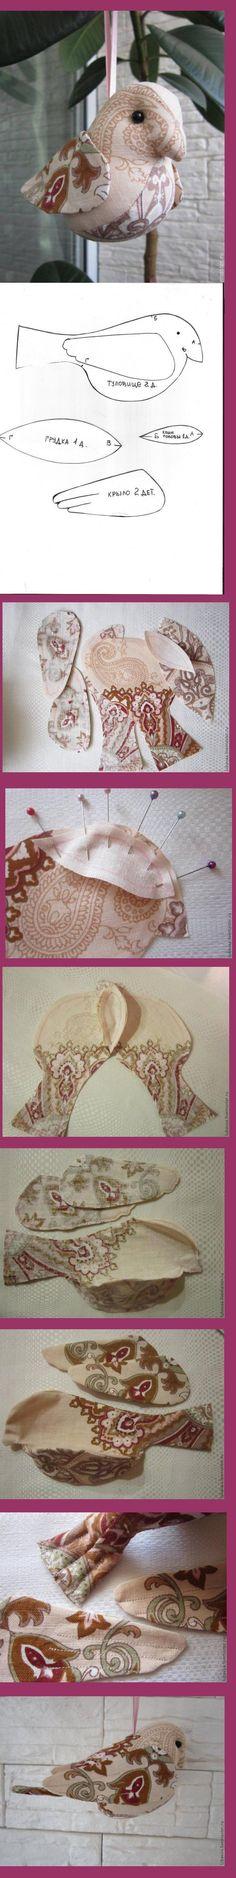 Bird Patterns, Doll Patterns, Sewing Patterns, Sewing Toys, Sewing Crafts, Sewing Projects, Bird Crafts, Doll Crafts, Felt Birds